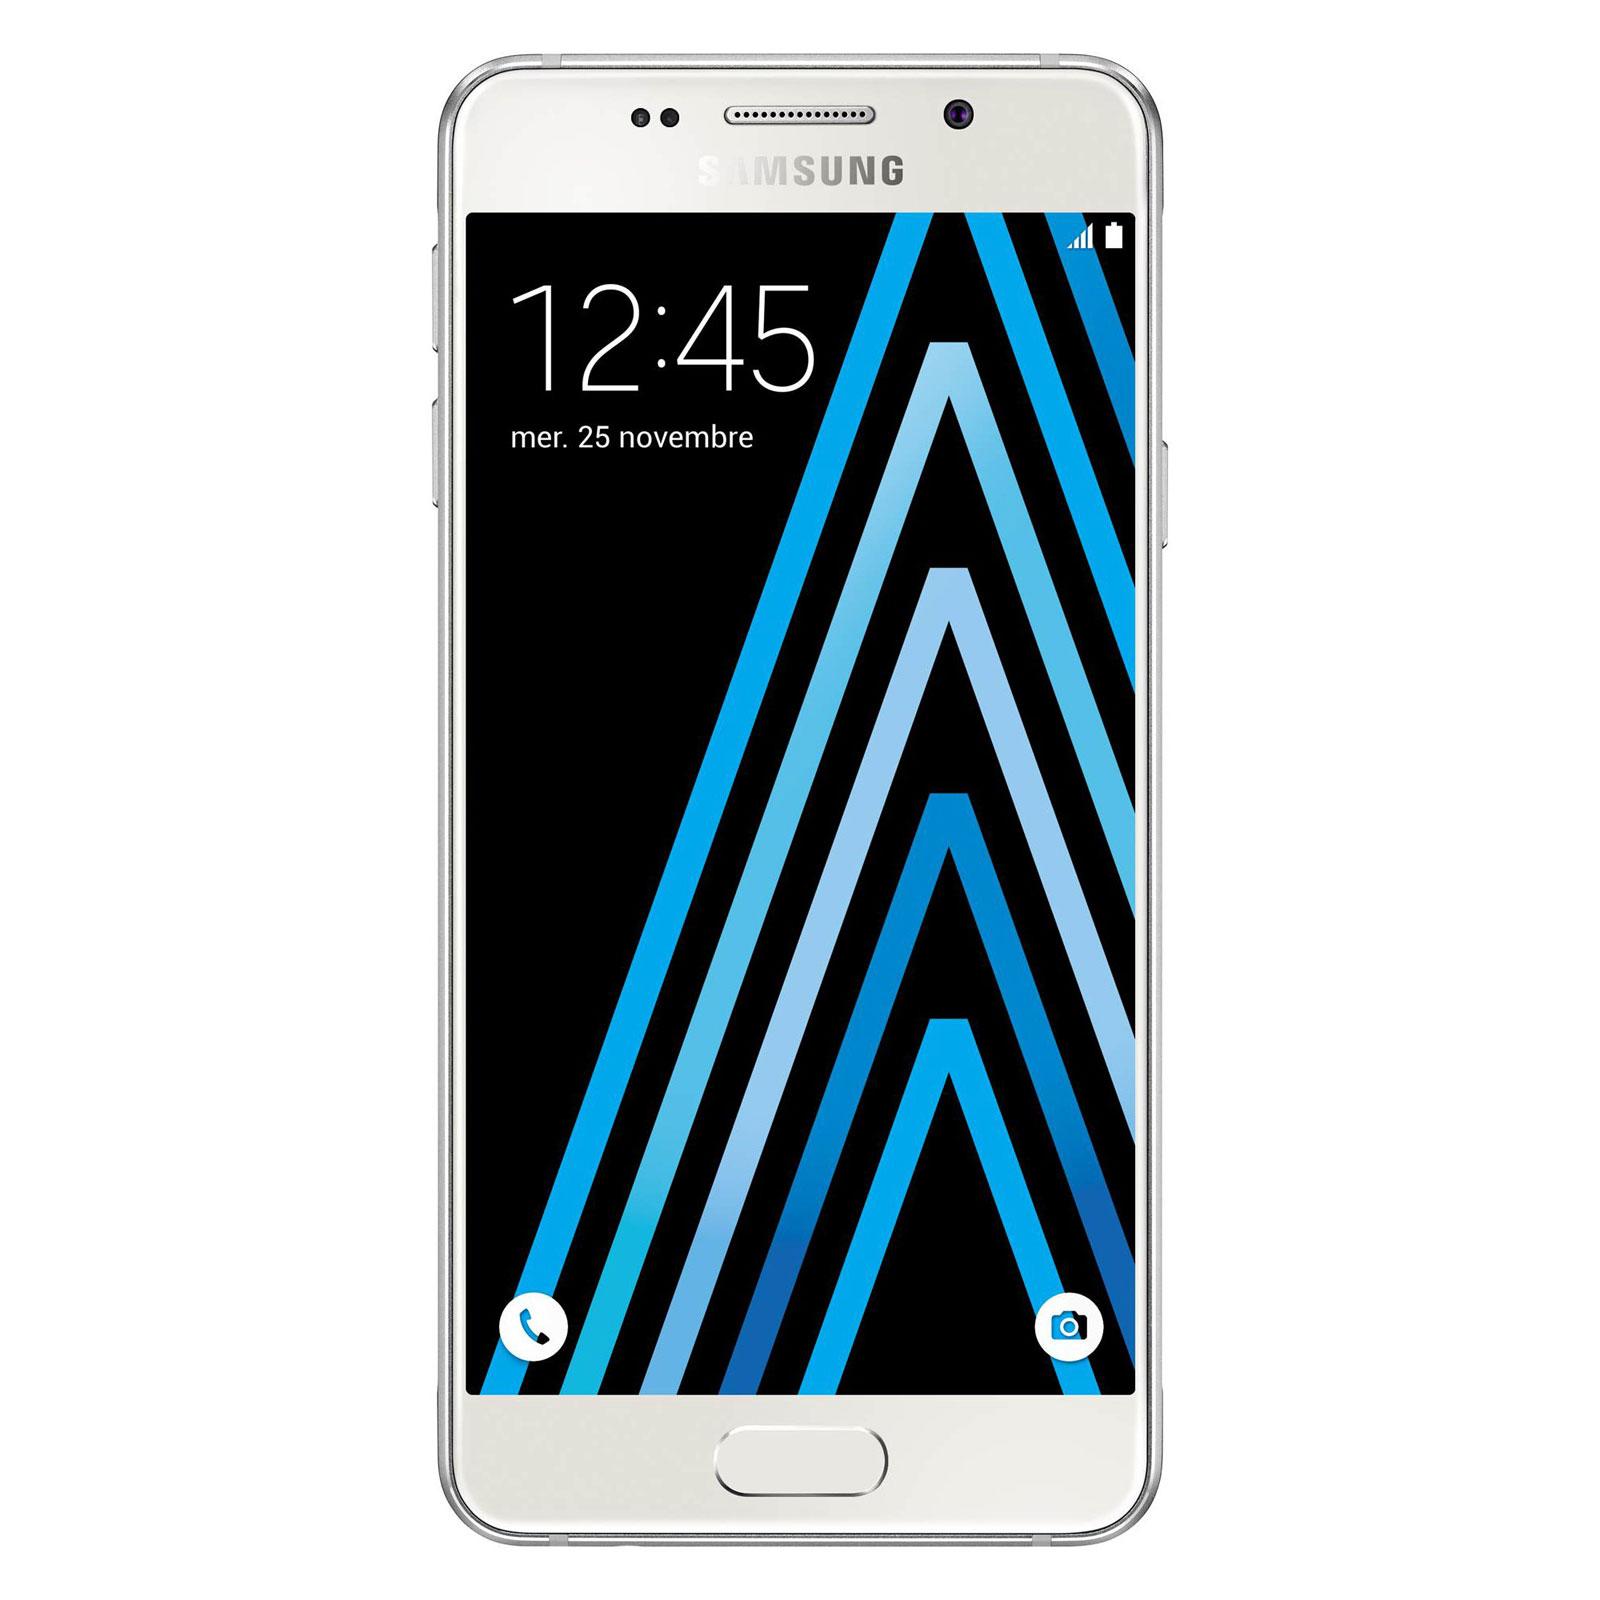 Mobile   smartphone Samsung Galaxy A3 2016 Blanc Smartphone 4G-LTE -  Snapdragon 410 Quad 97d9aada443b